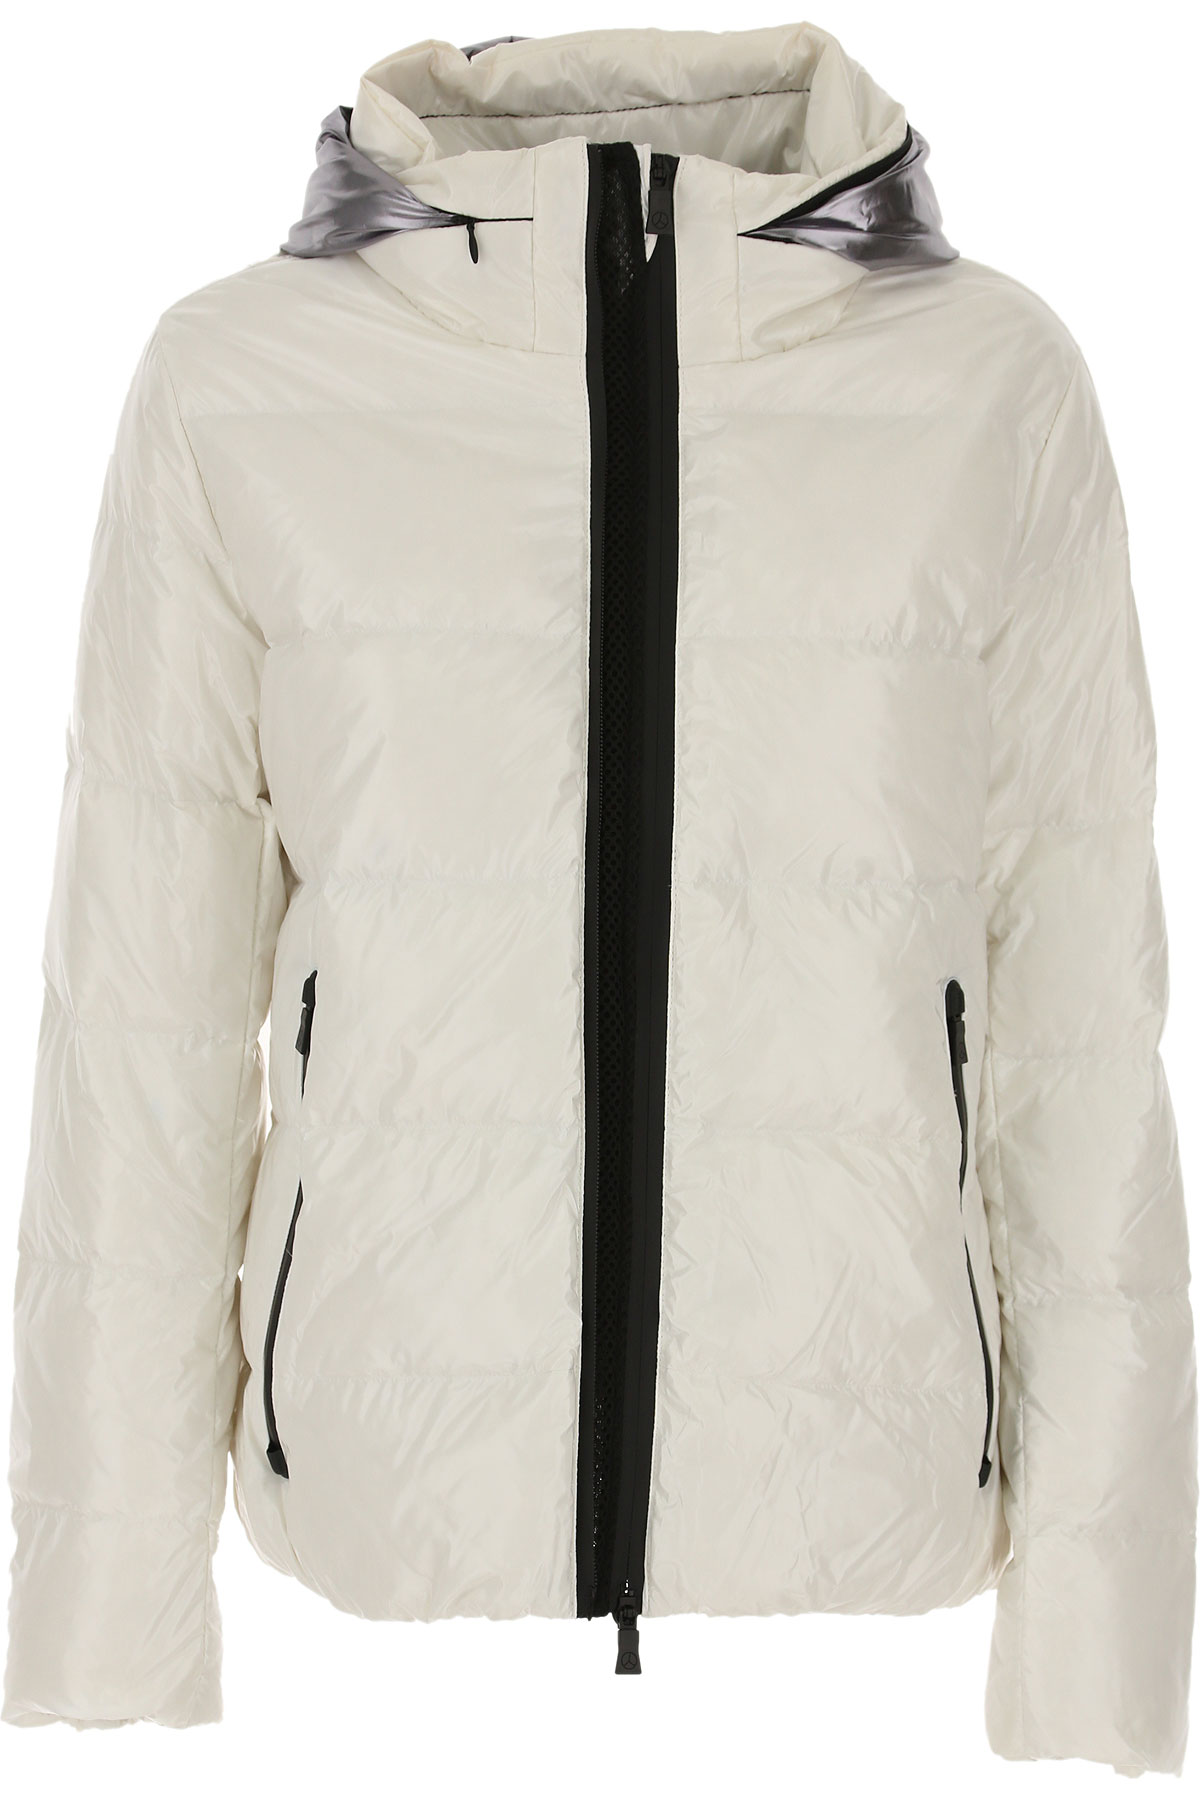 People of Shibuya Down Jacket for Women, Puffer Ski Jacket On Sale, White, polyamide, 2019, 4 6 8